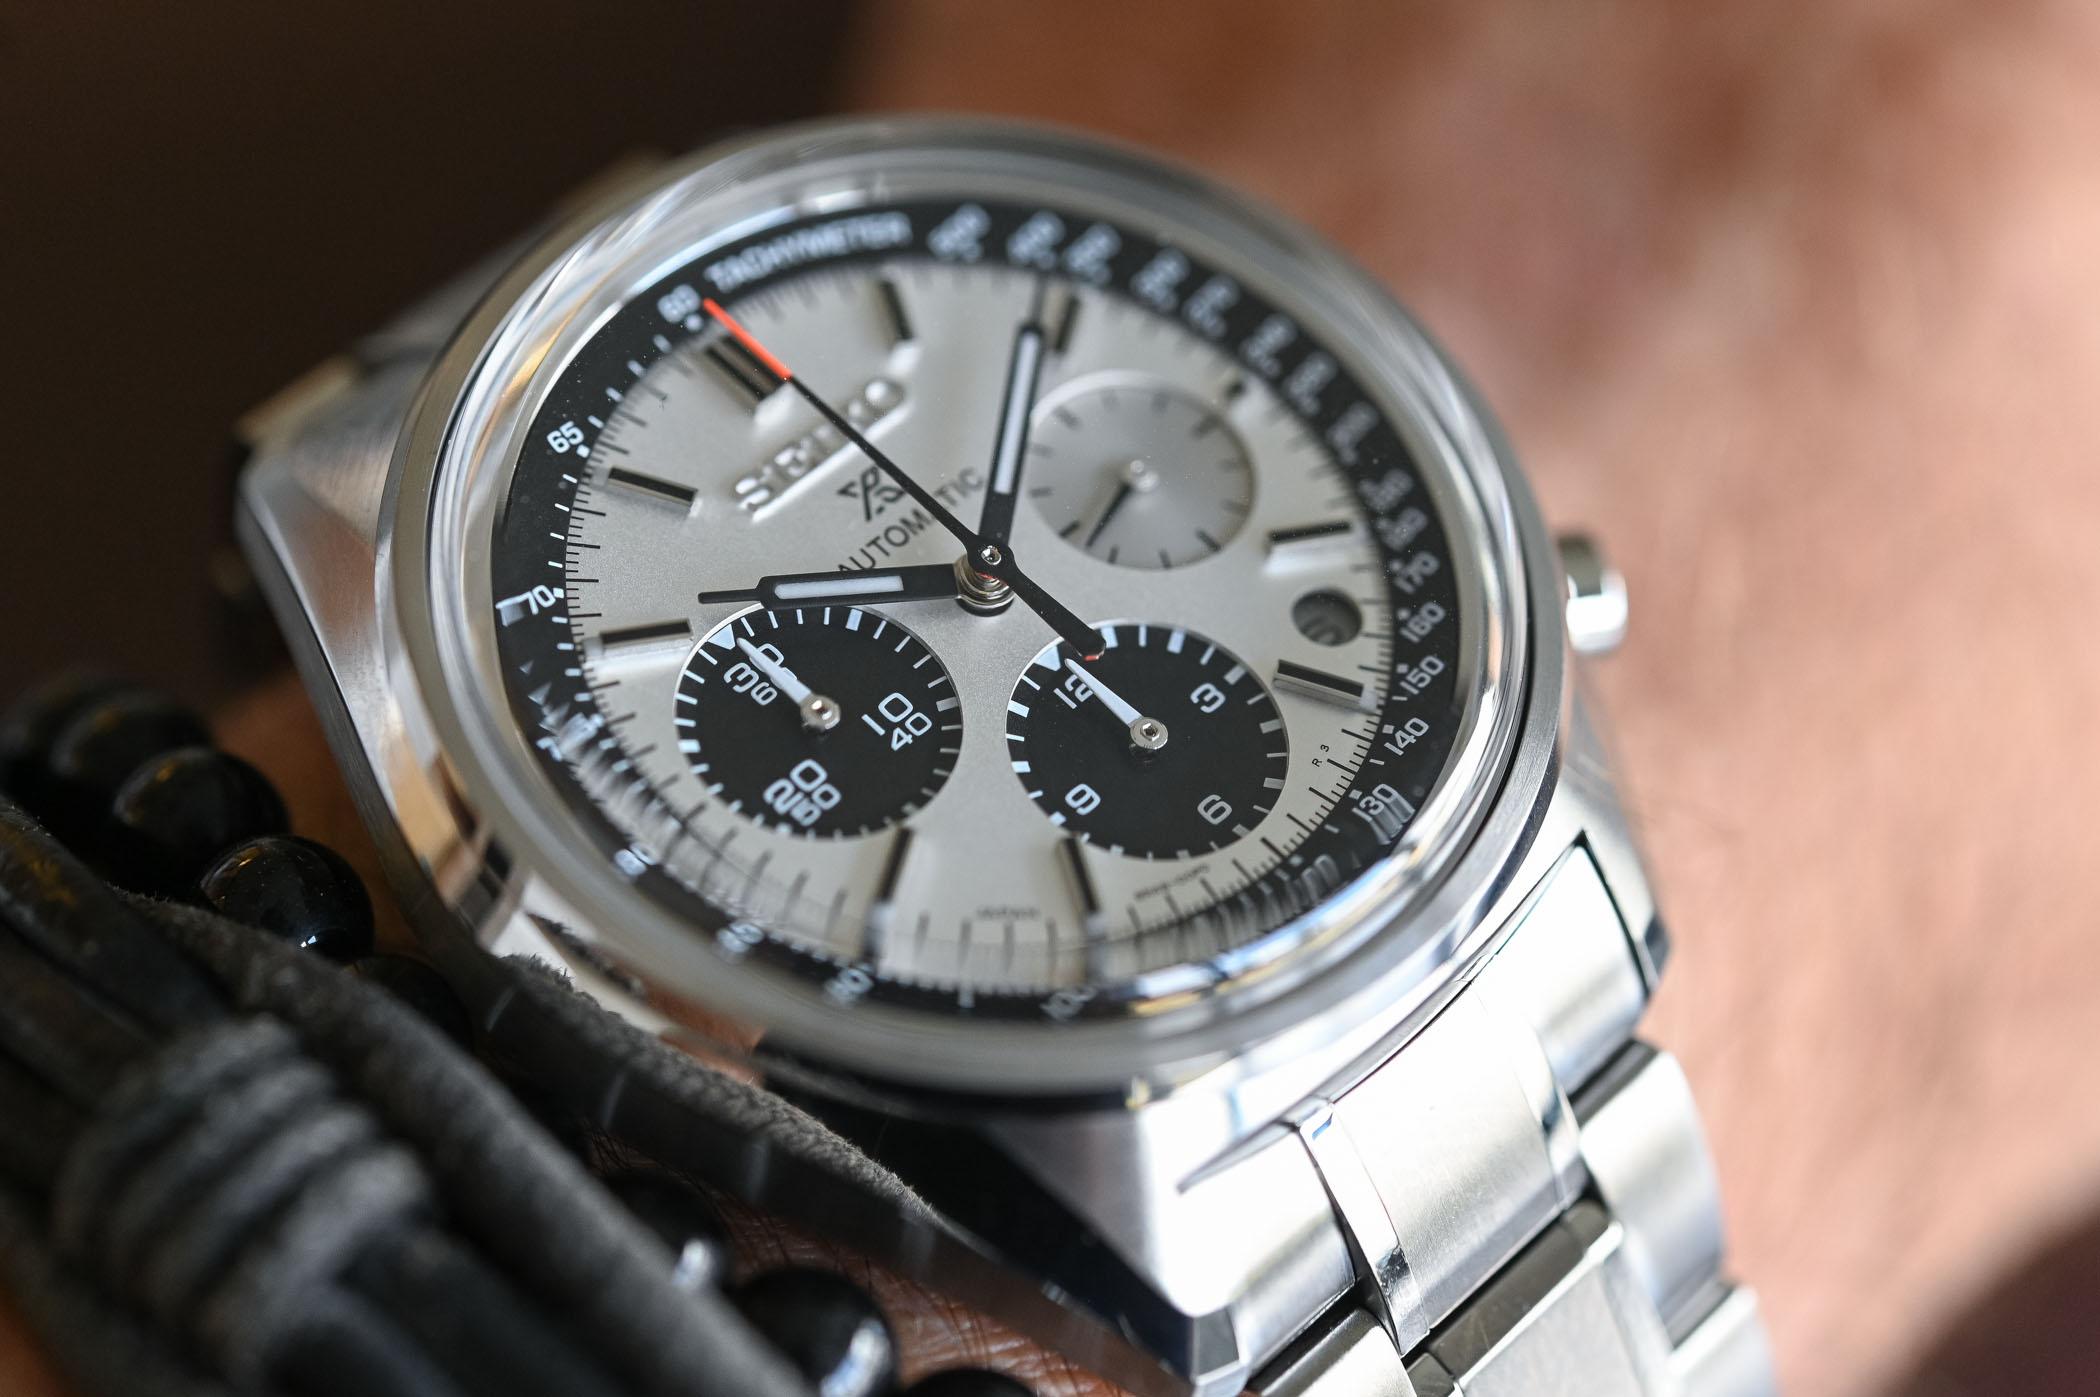 Seiko Prospex Automatic Chronograph 50th Anniversary Limited Edition SRQ029